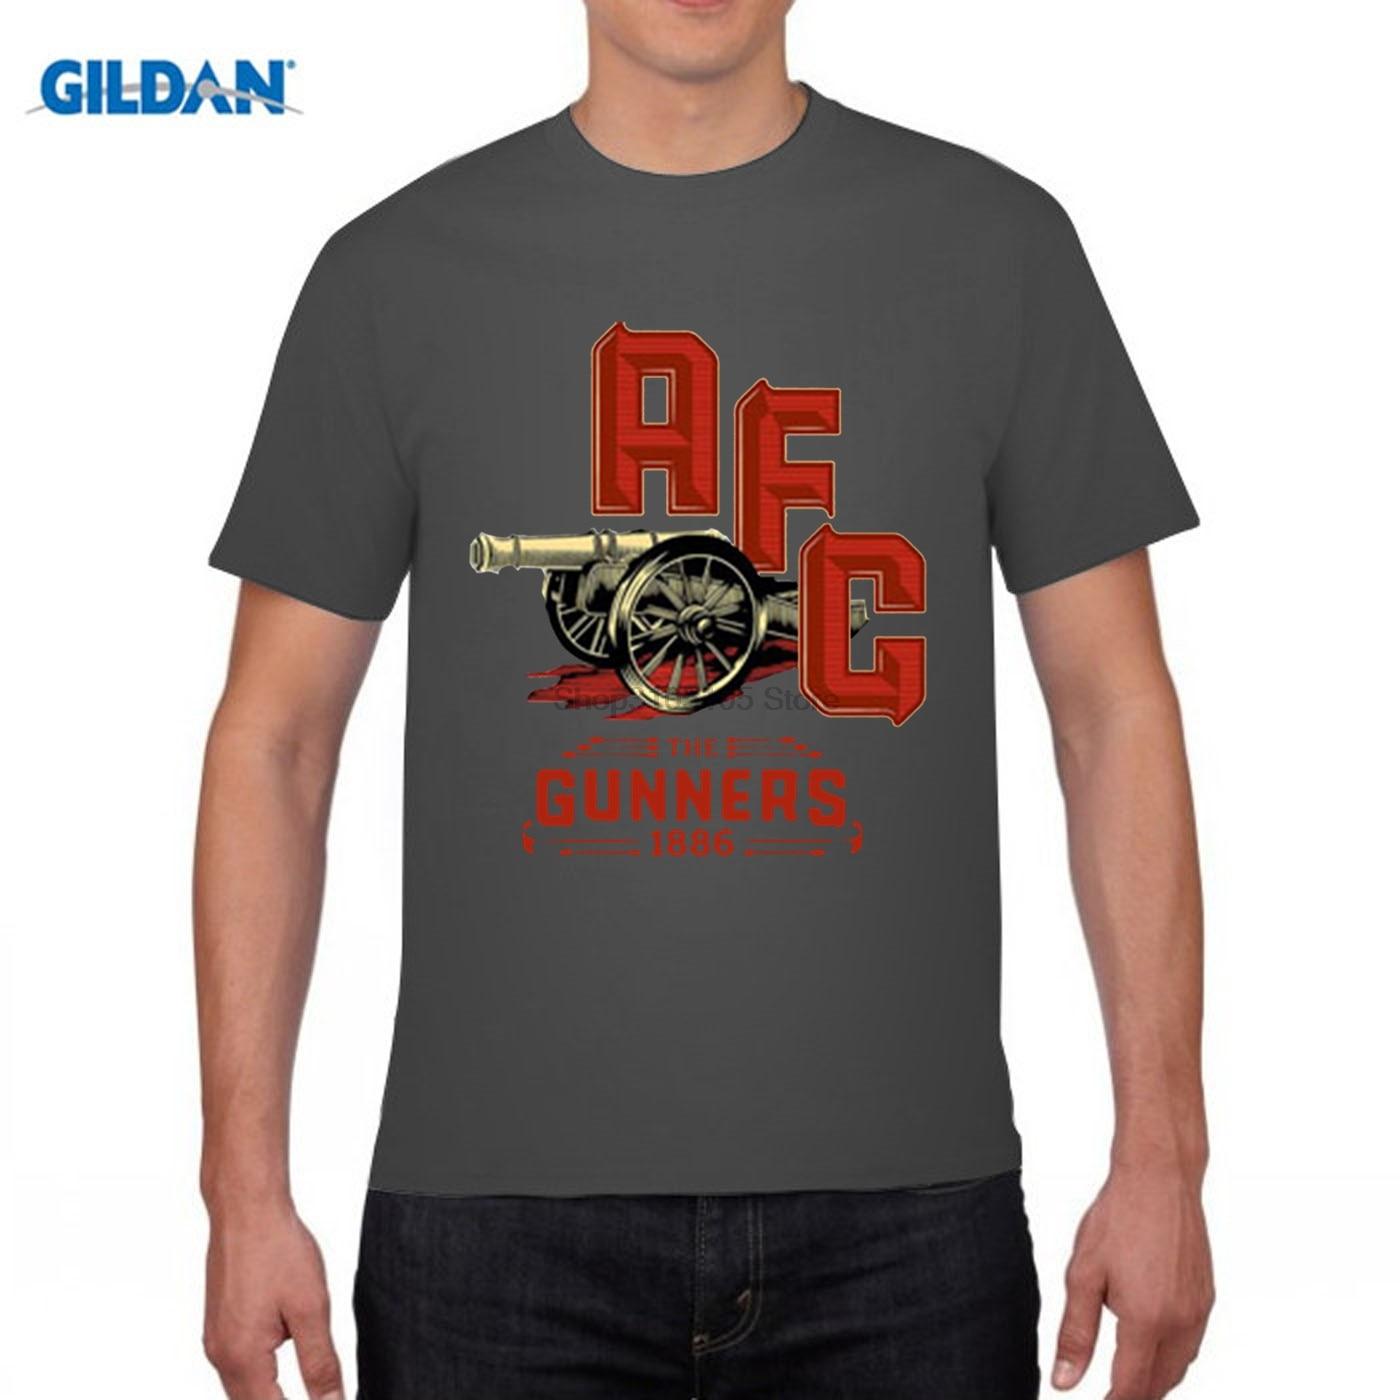 GILDAN funny men t shirt London Holloway Premier League Emirates Stadium ARS Mesut Ozil t-shirt jersey fan